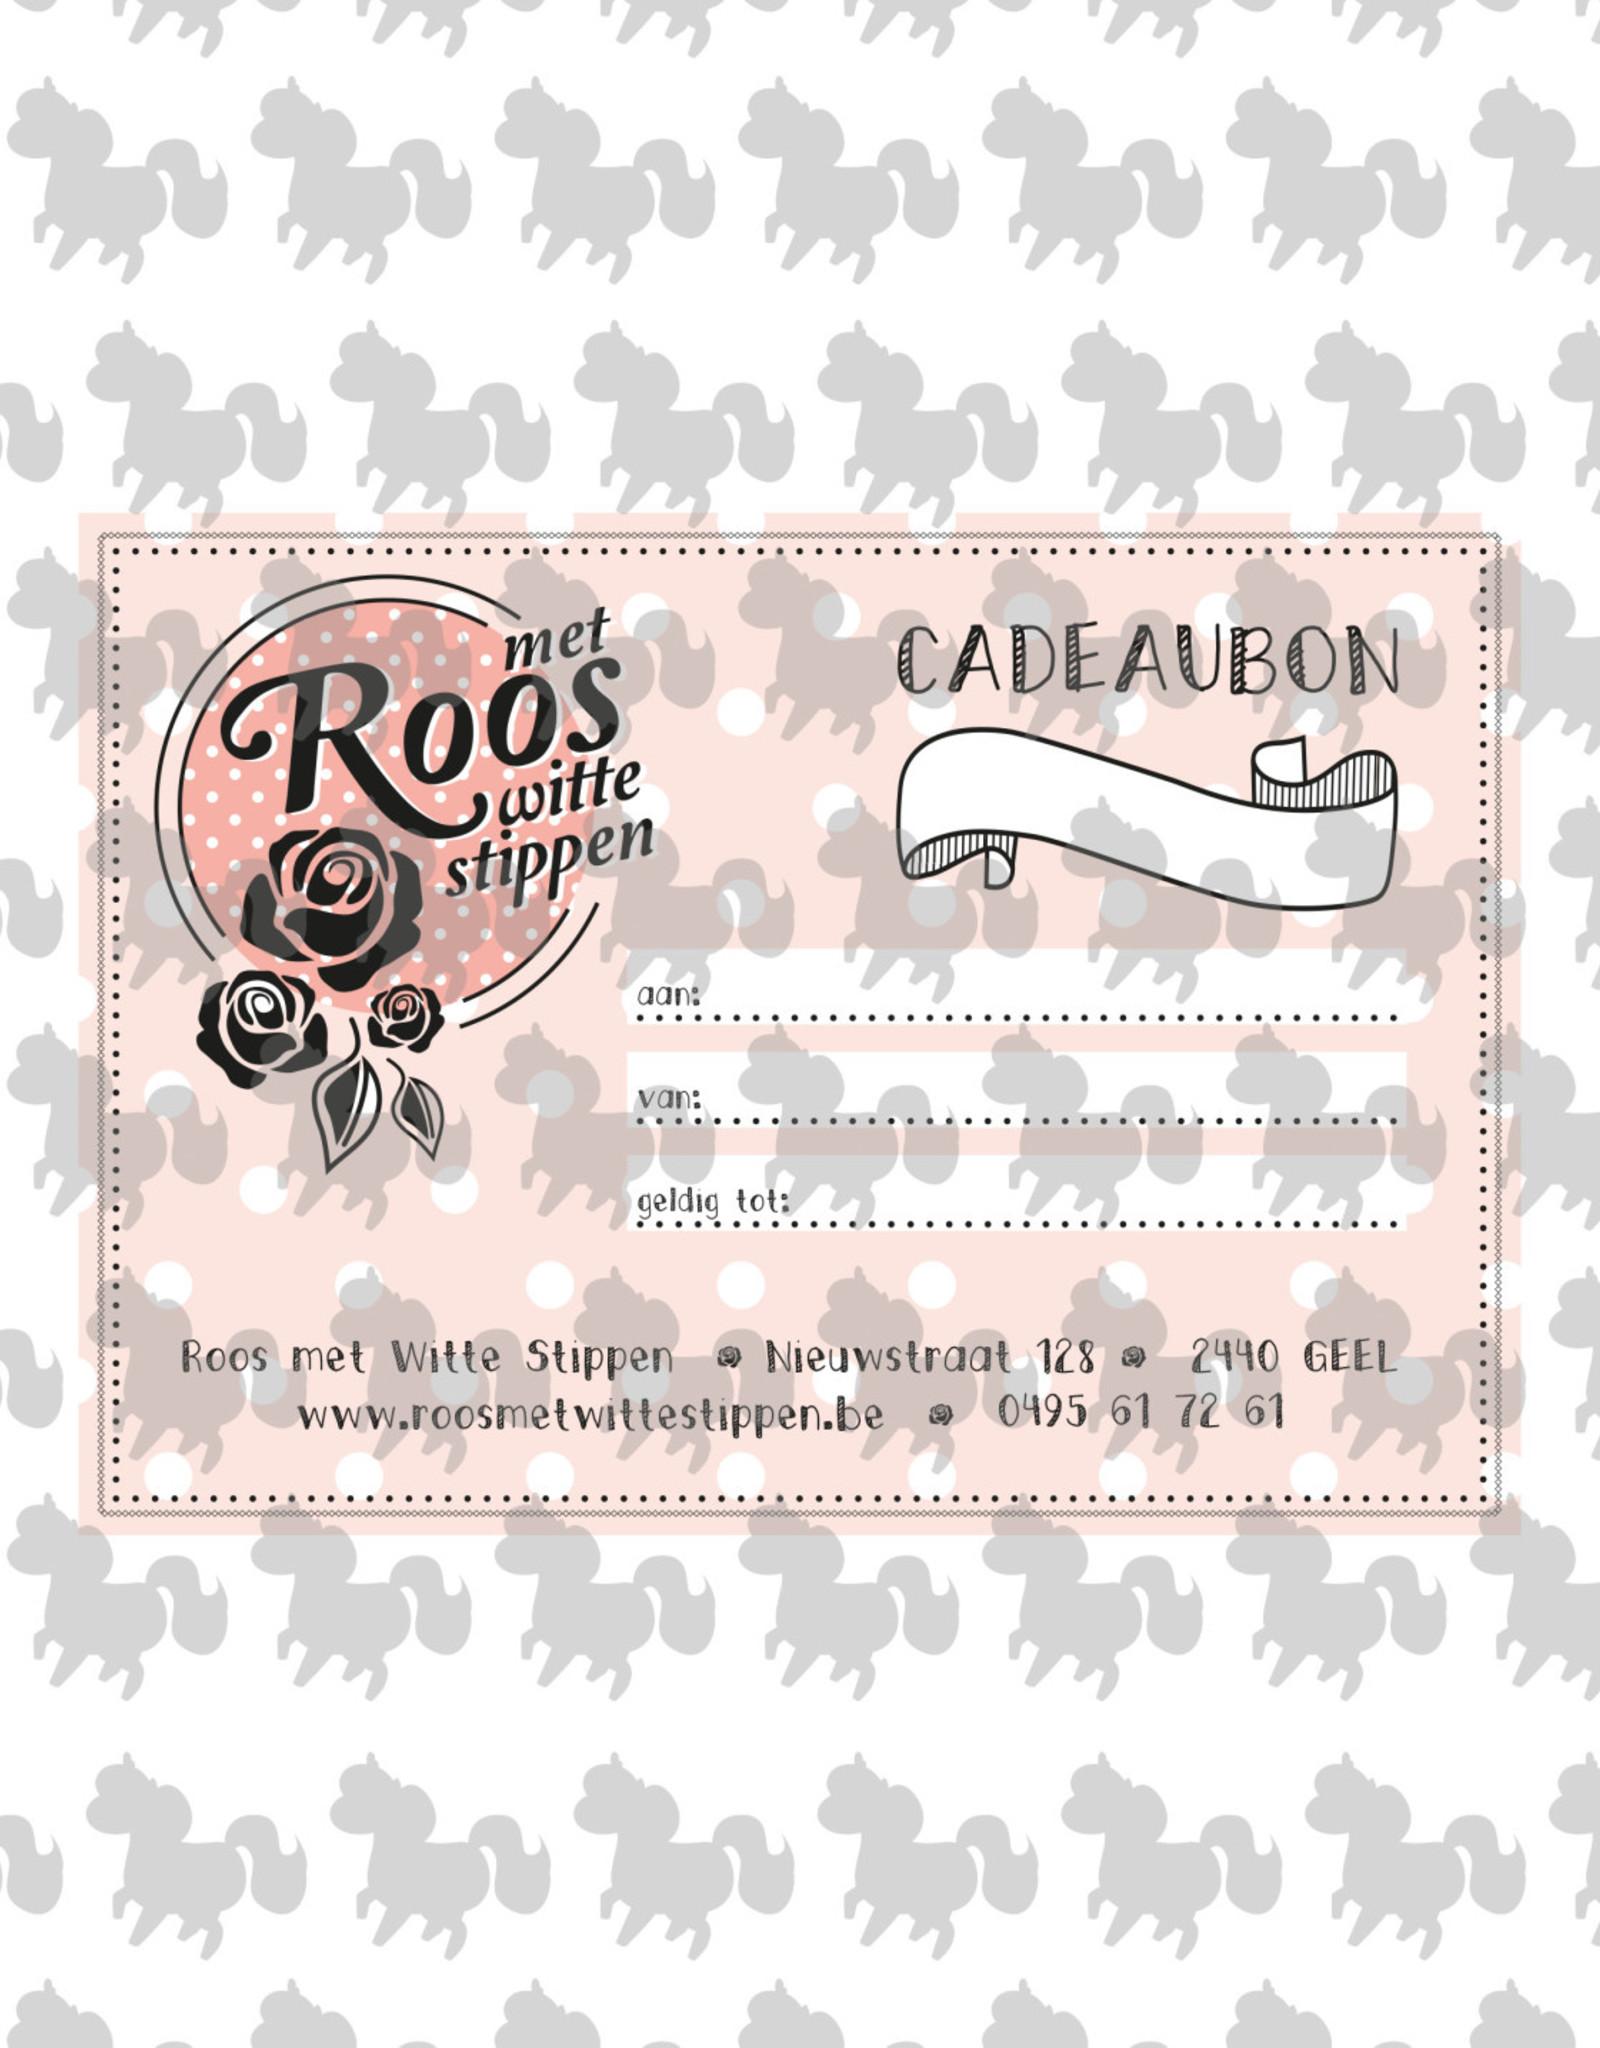 Roos met Witte Stippen Cadeaubon 20 euro